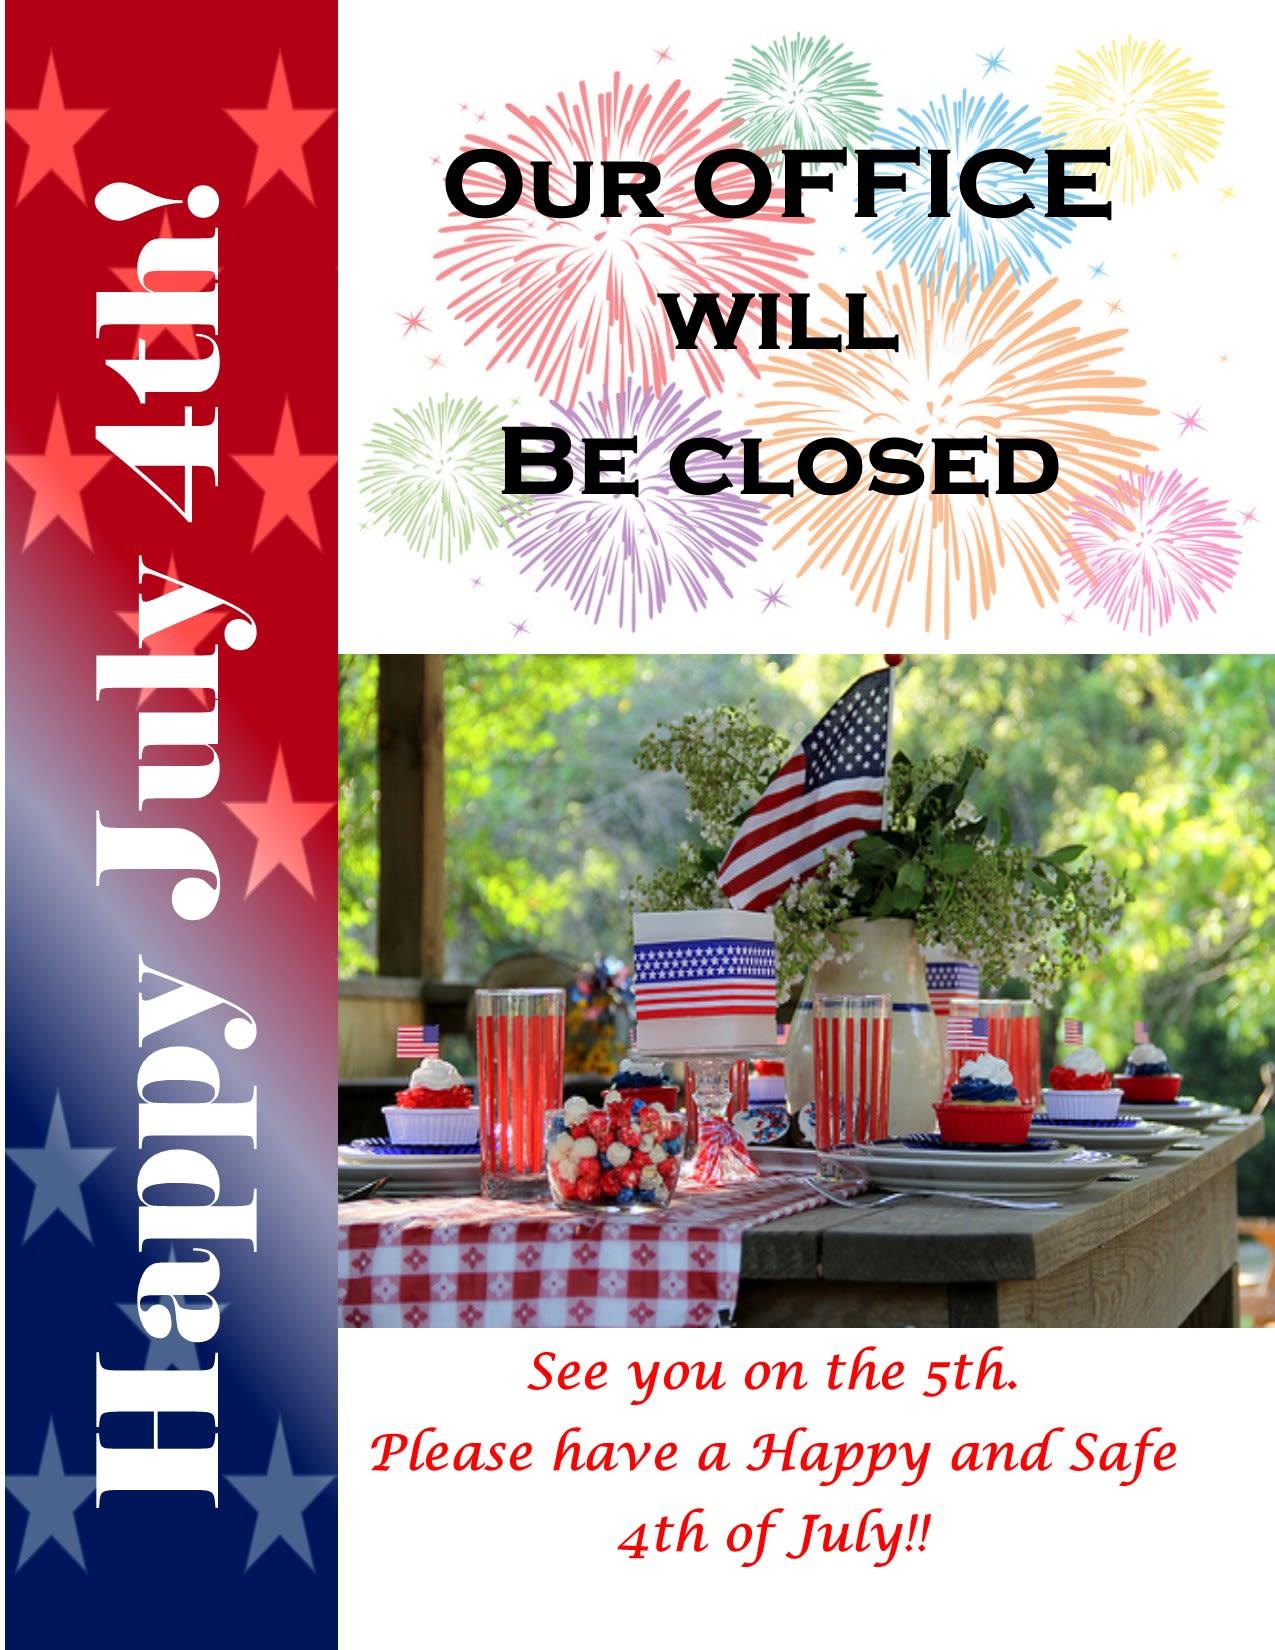 4th of July Closure